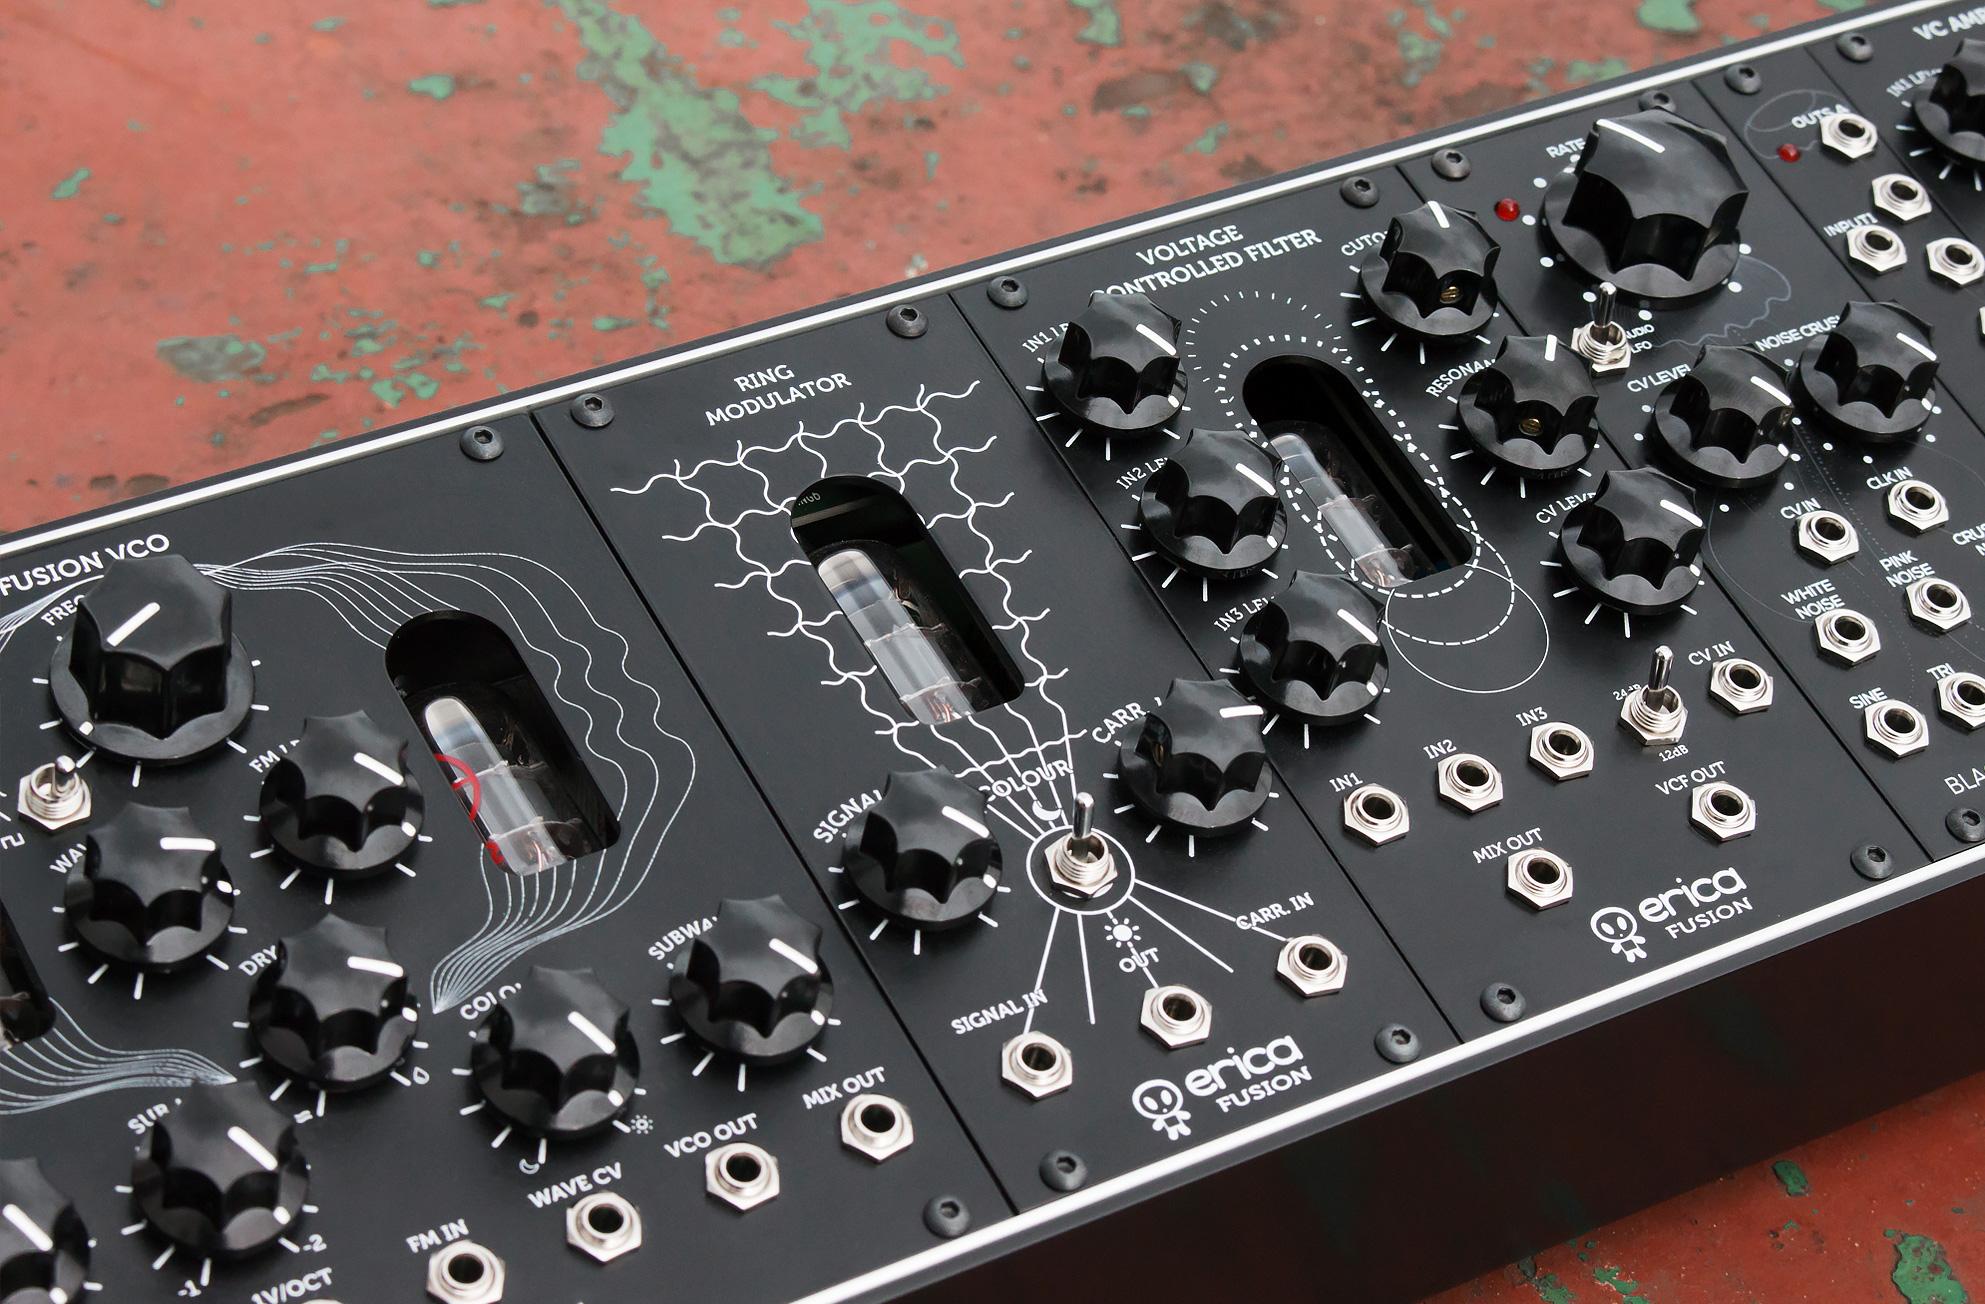 syst u00e8me modulaire analogique  u00e0 lampes au format eurorack erica synth u00e9 fusion drone system